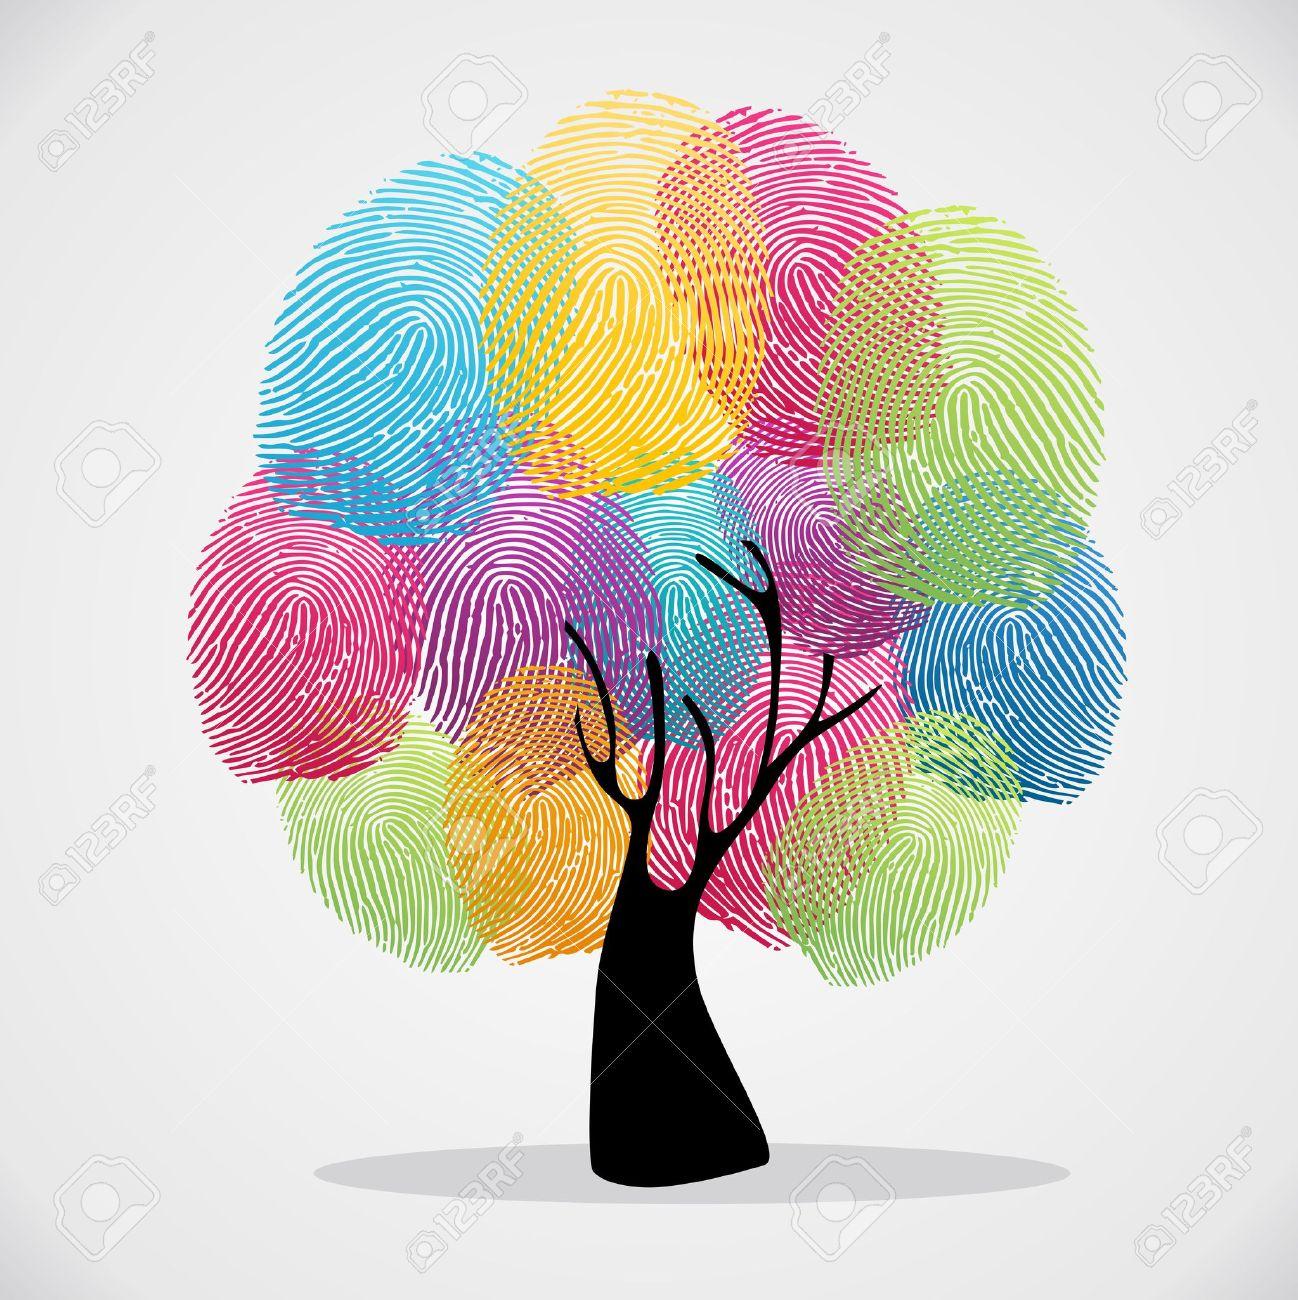 Diversity color tree finger prints illustration background set. file layered for easy manipulation and custom coloring. - 20633211